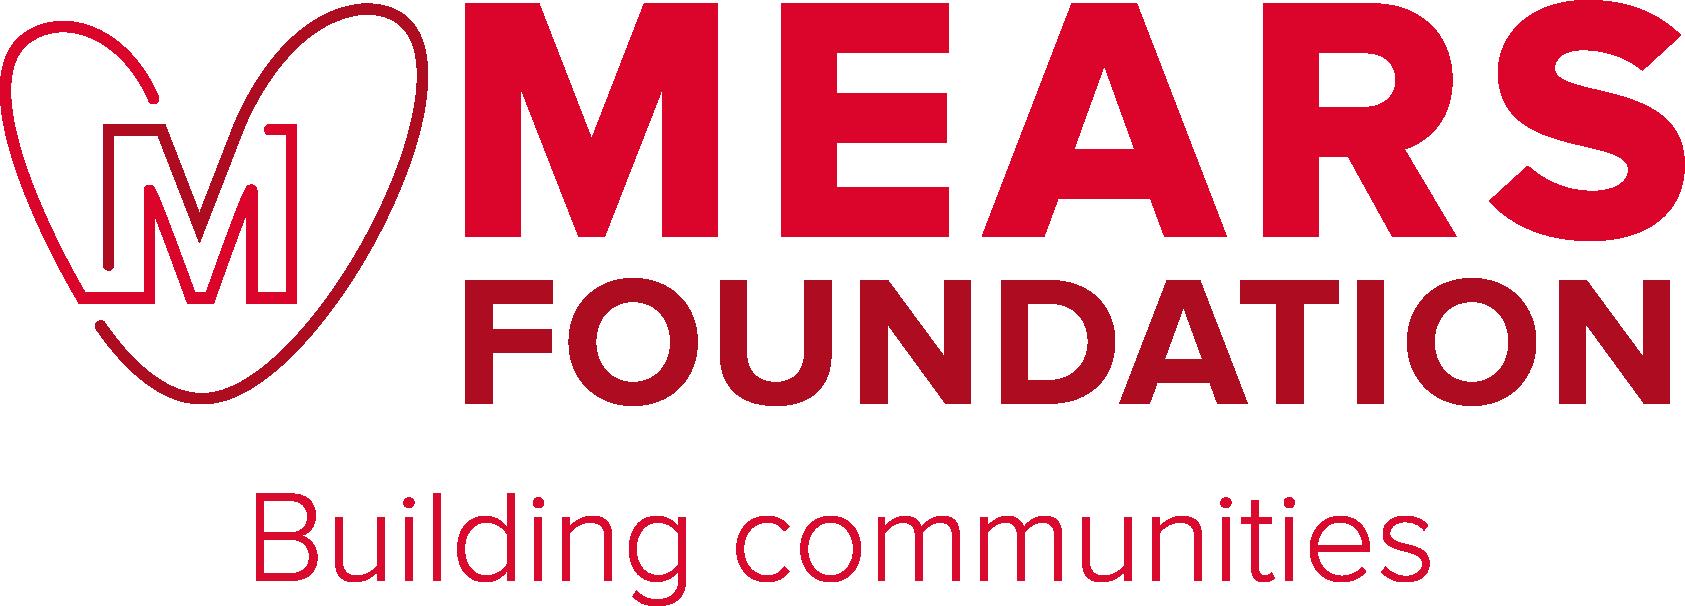 Mears Foundation Logo